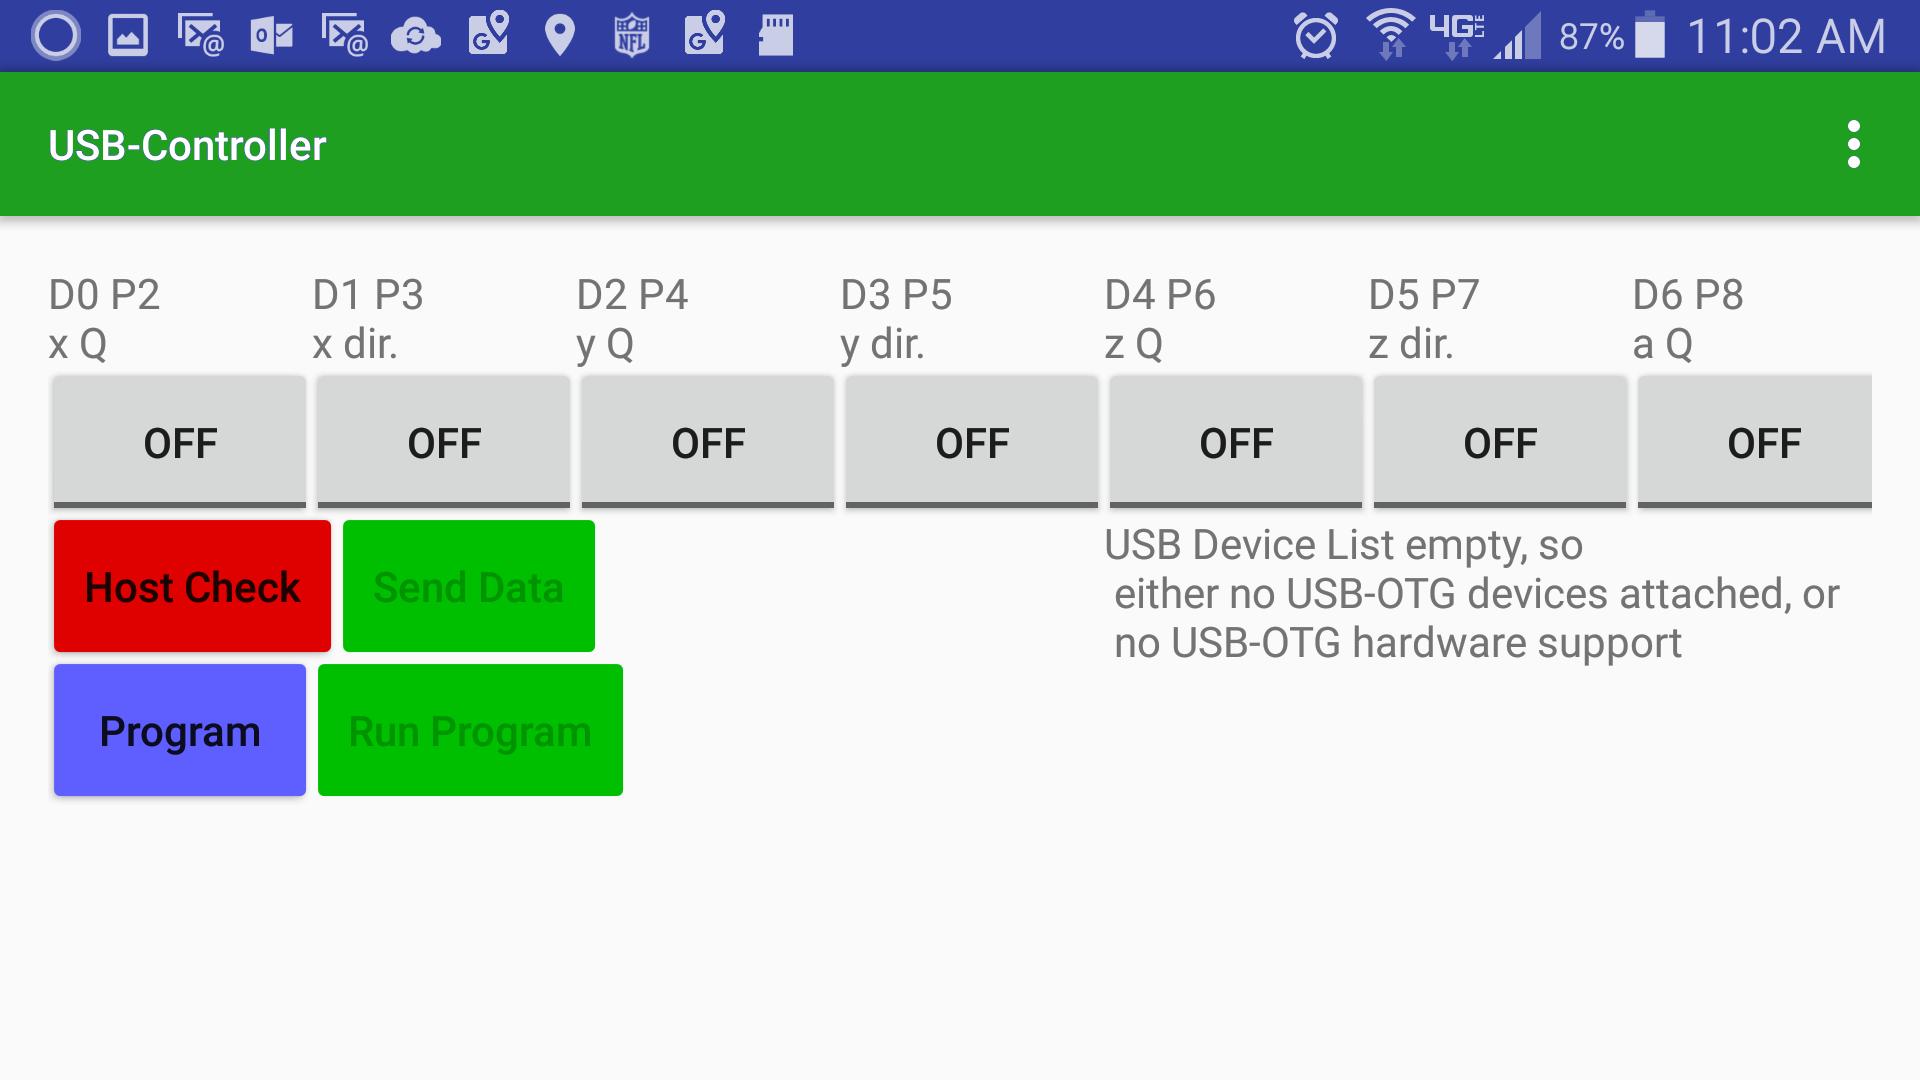 USB-Controller